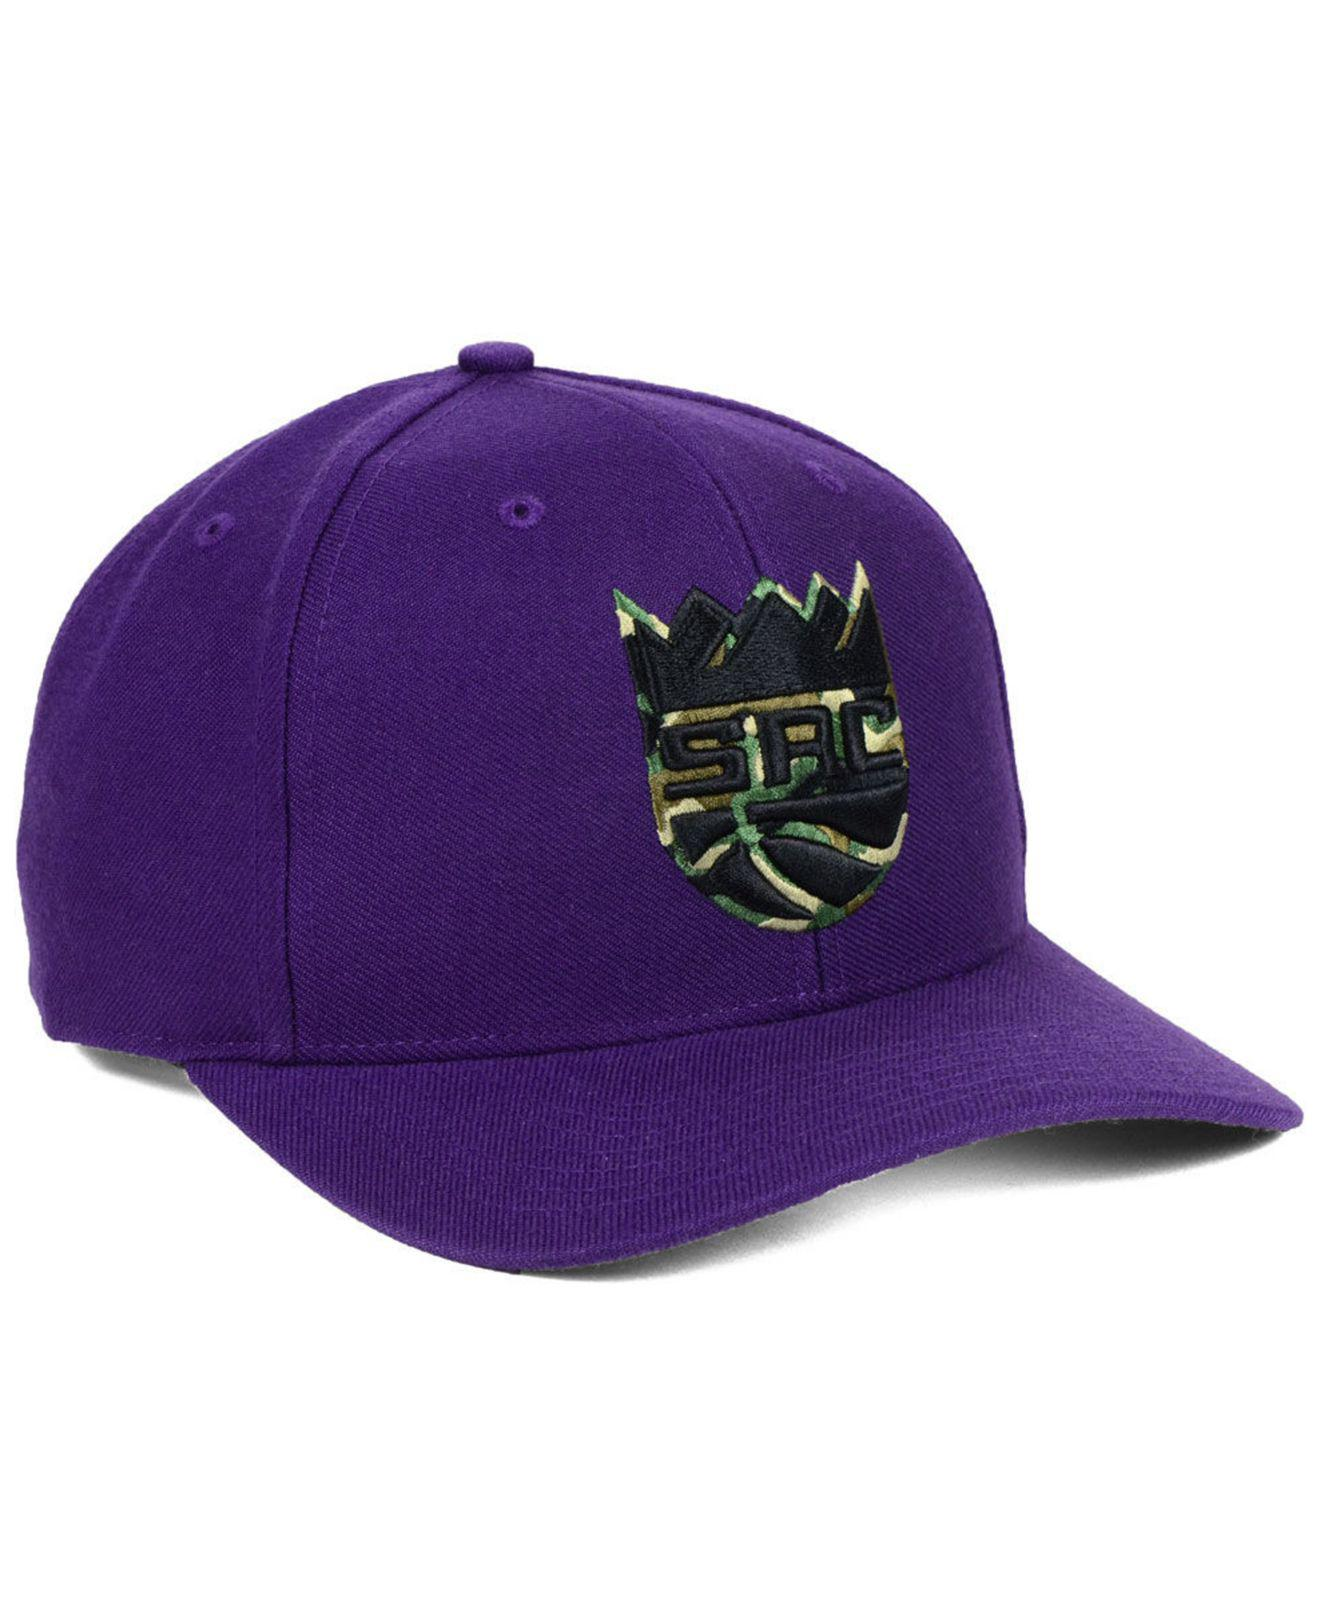 cheaper af529 7932f ... all region mvp cap in black f77a4 06957  promo code for 47 brand purple  sacramento kings camfill mvp cap for men lyst. view